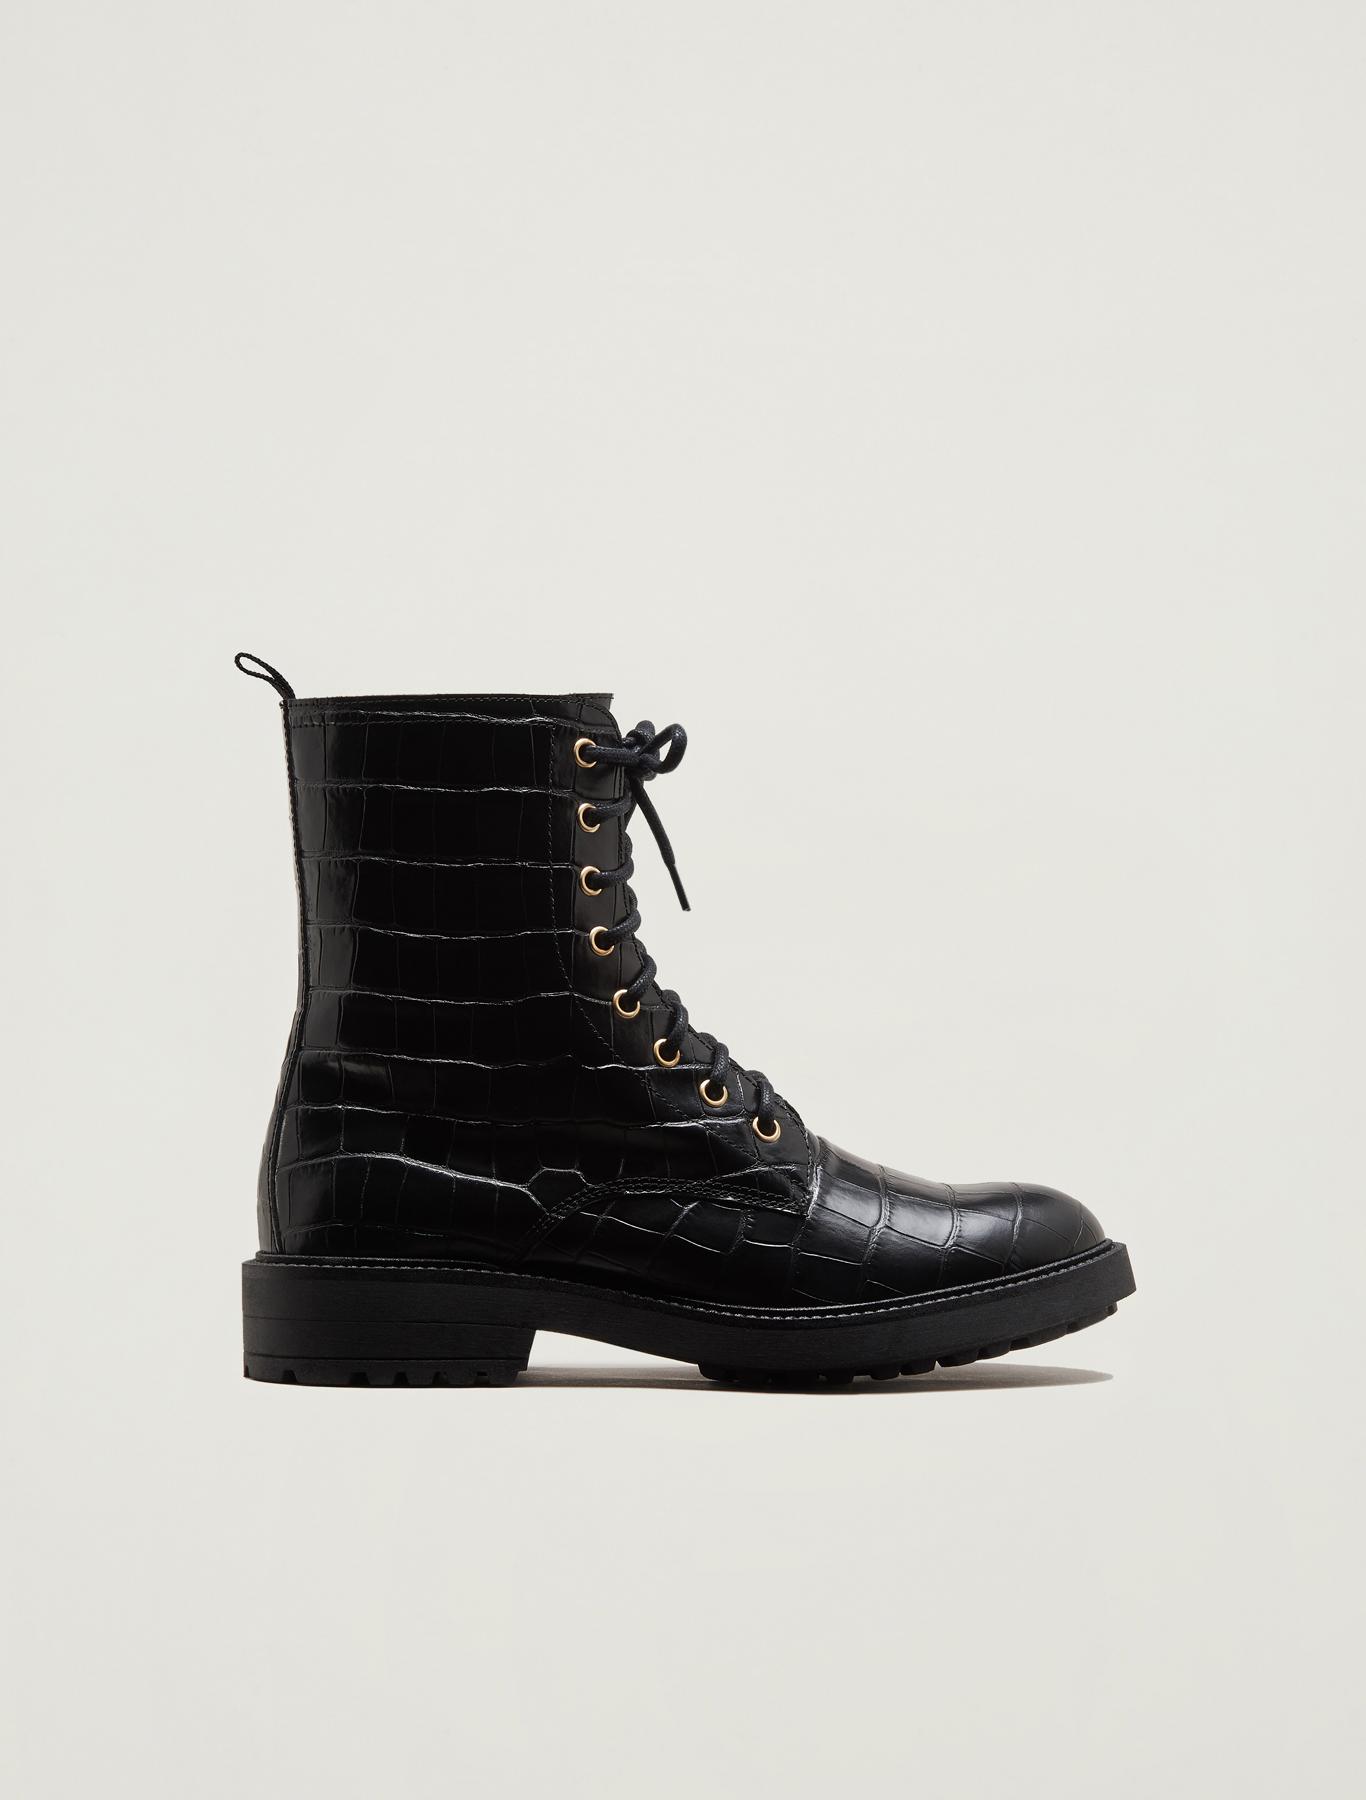 Crocodile-print leather combat boots - black - pennyblack